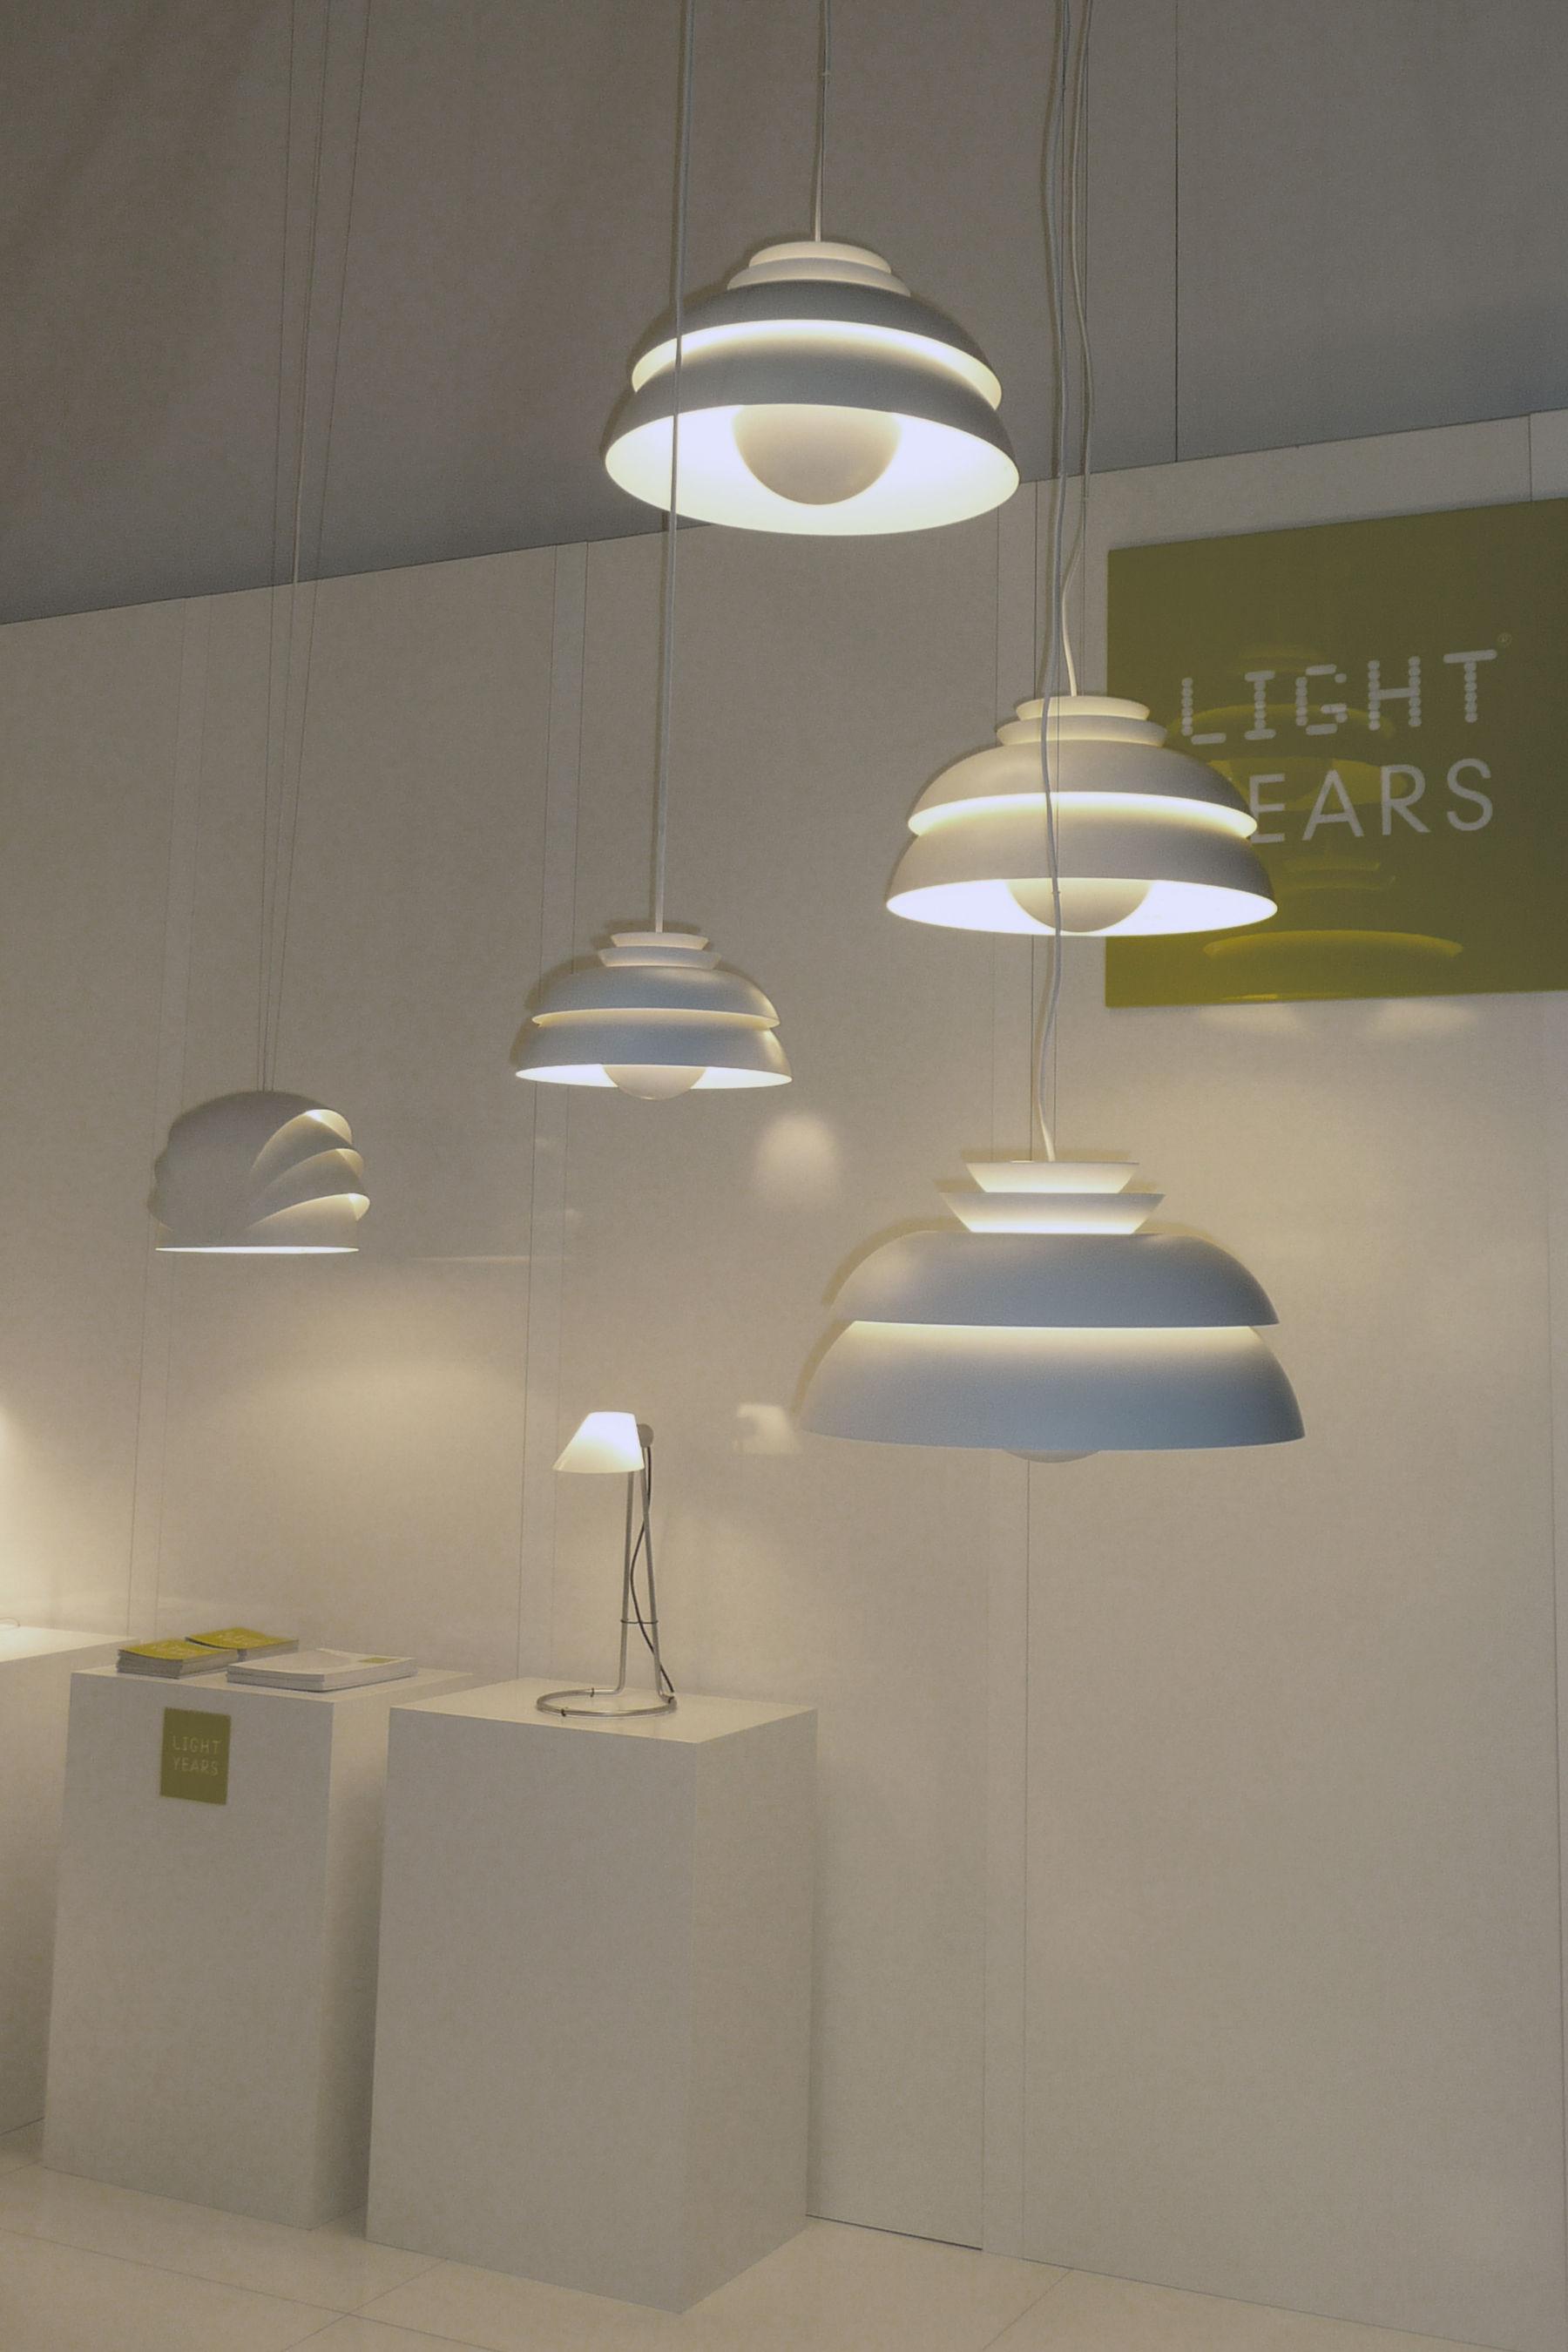 concert lamp